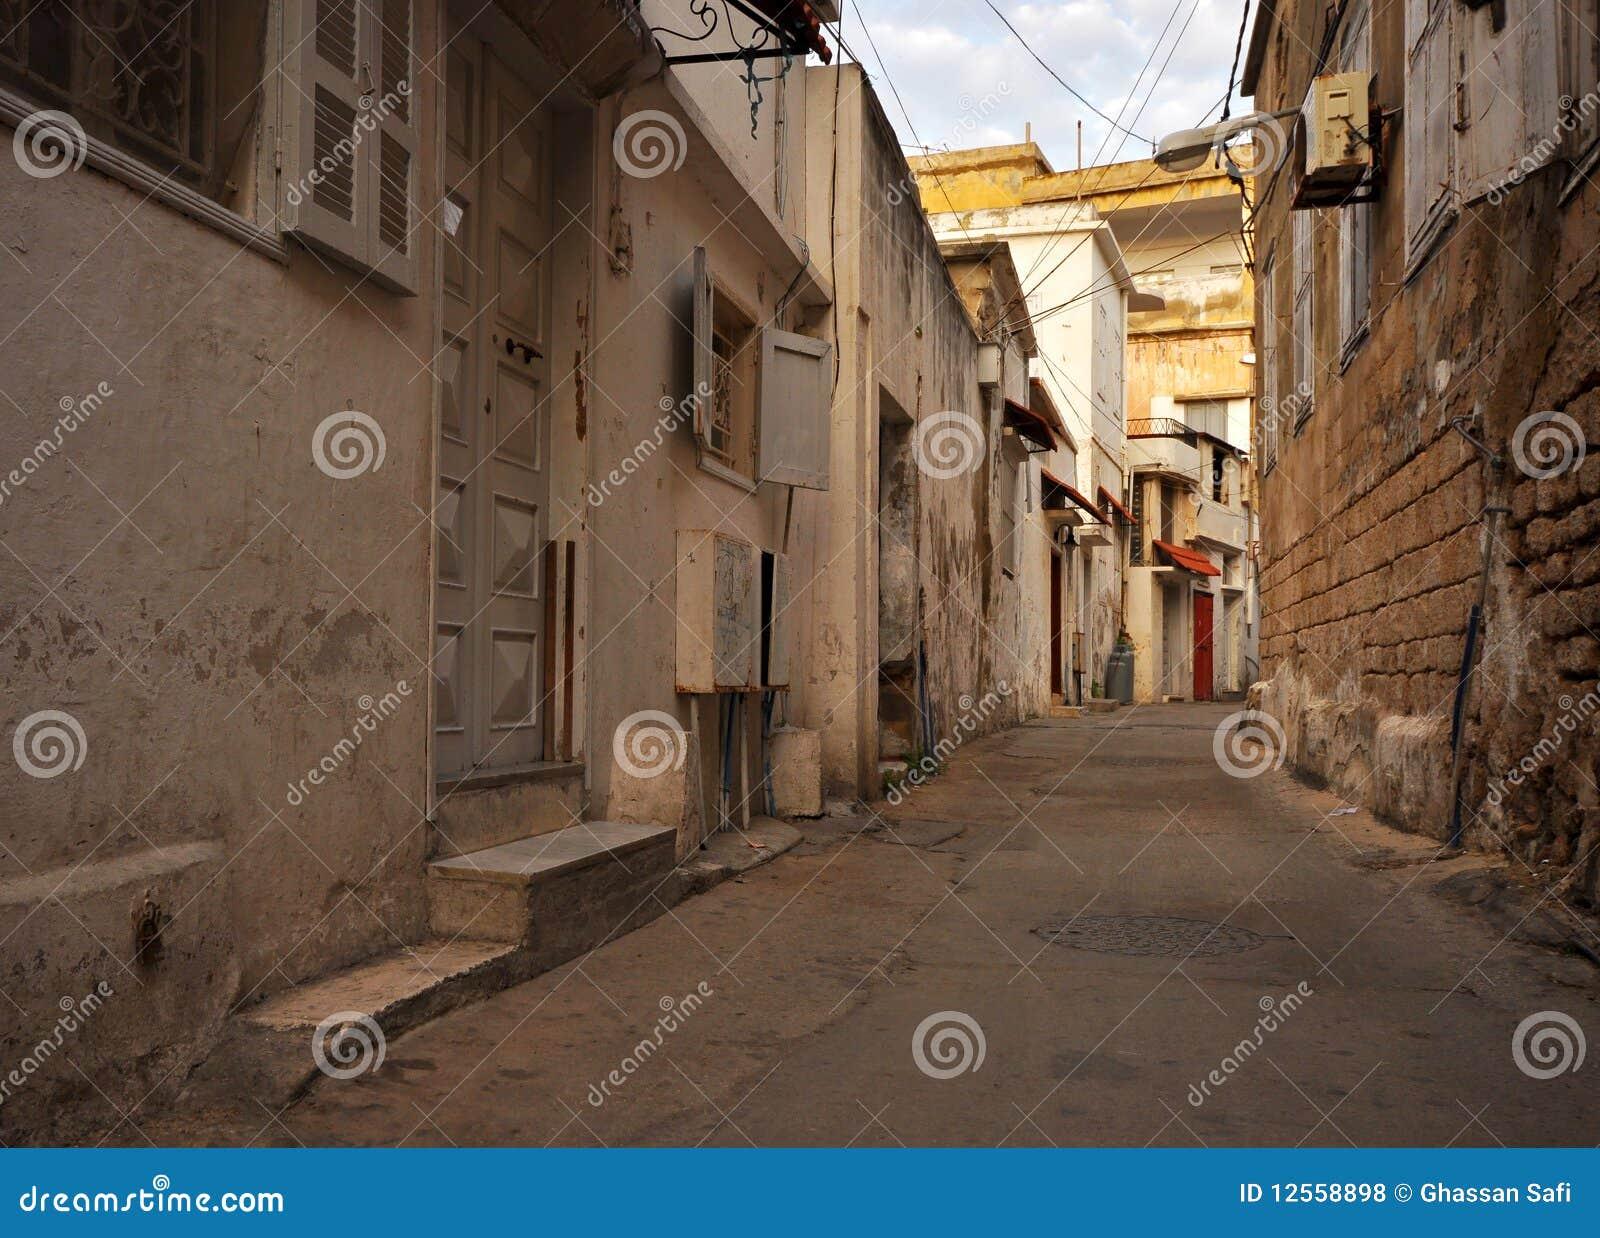 Old_street_01